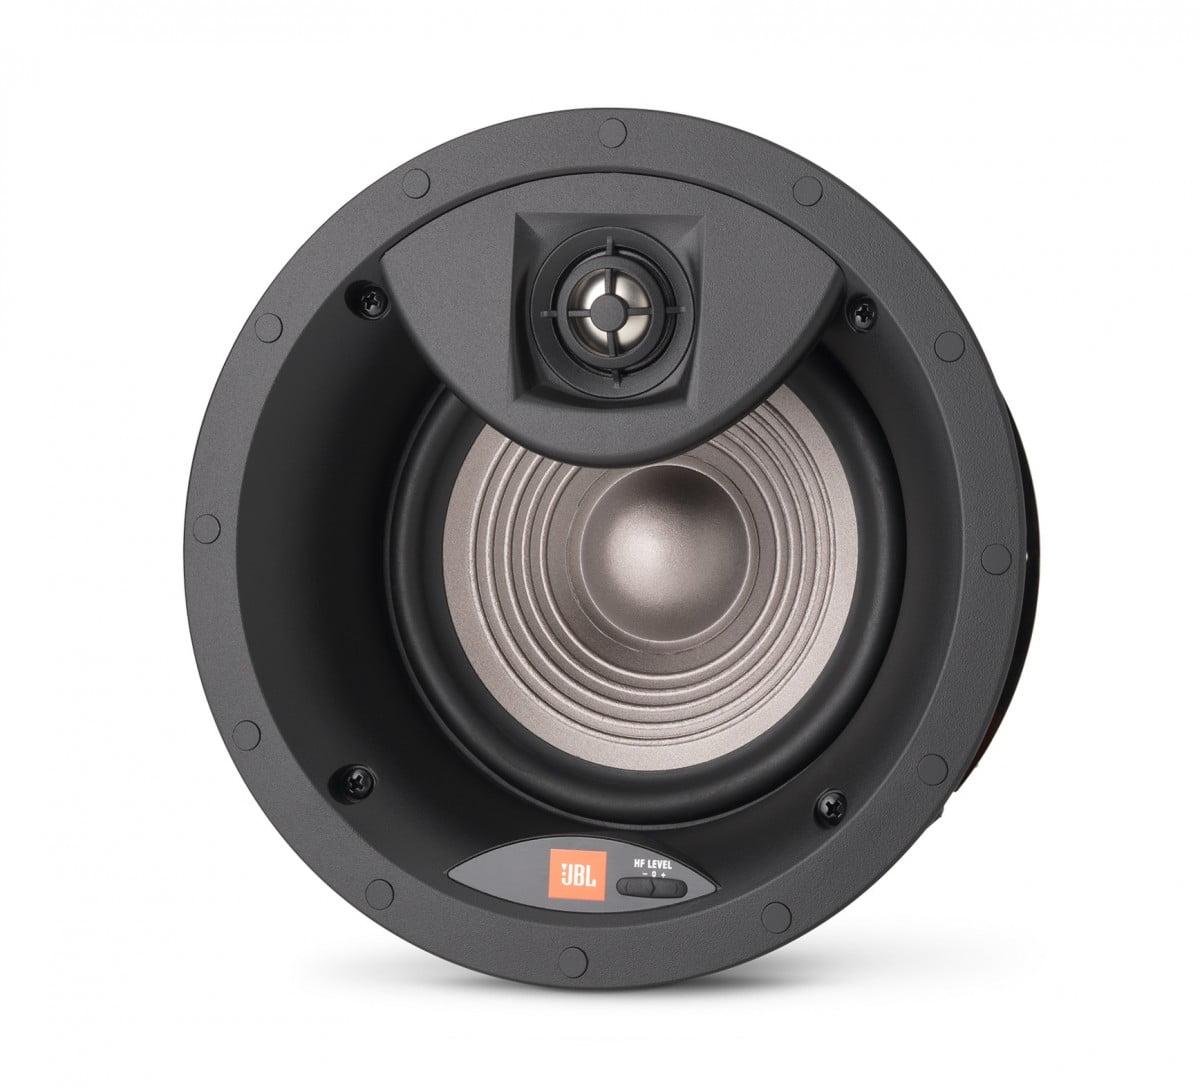 Ceiling Speaker Volume Control Wiring Diagram Question About 70 Volt Audio System 4 Speakers For Bogen Pa Repair Elsalvadorla 70v